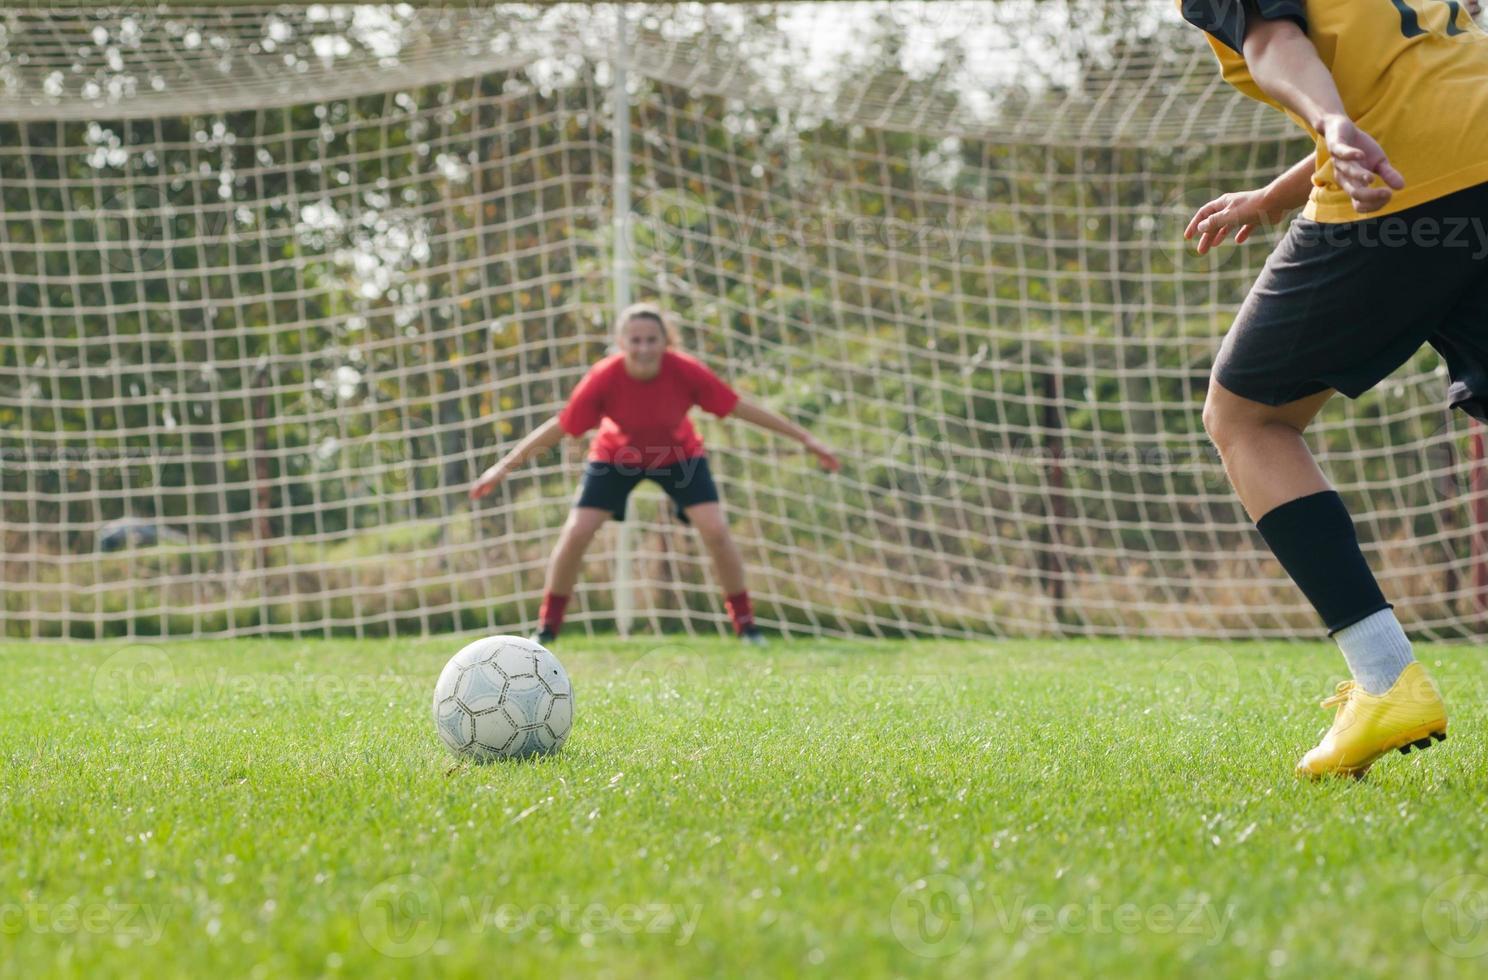 futebol foto